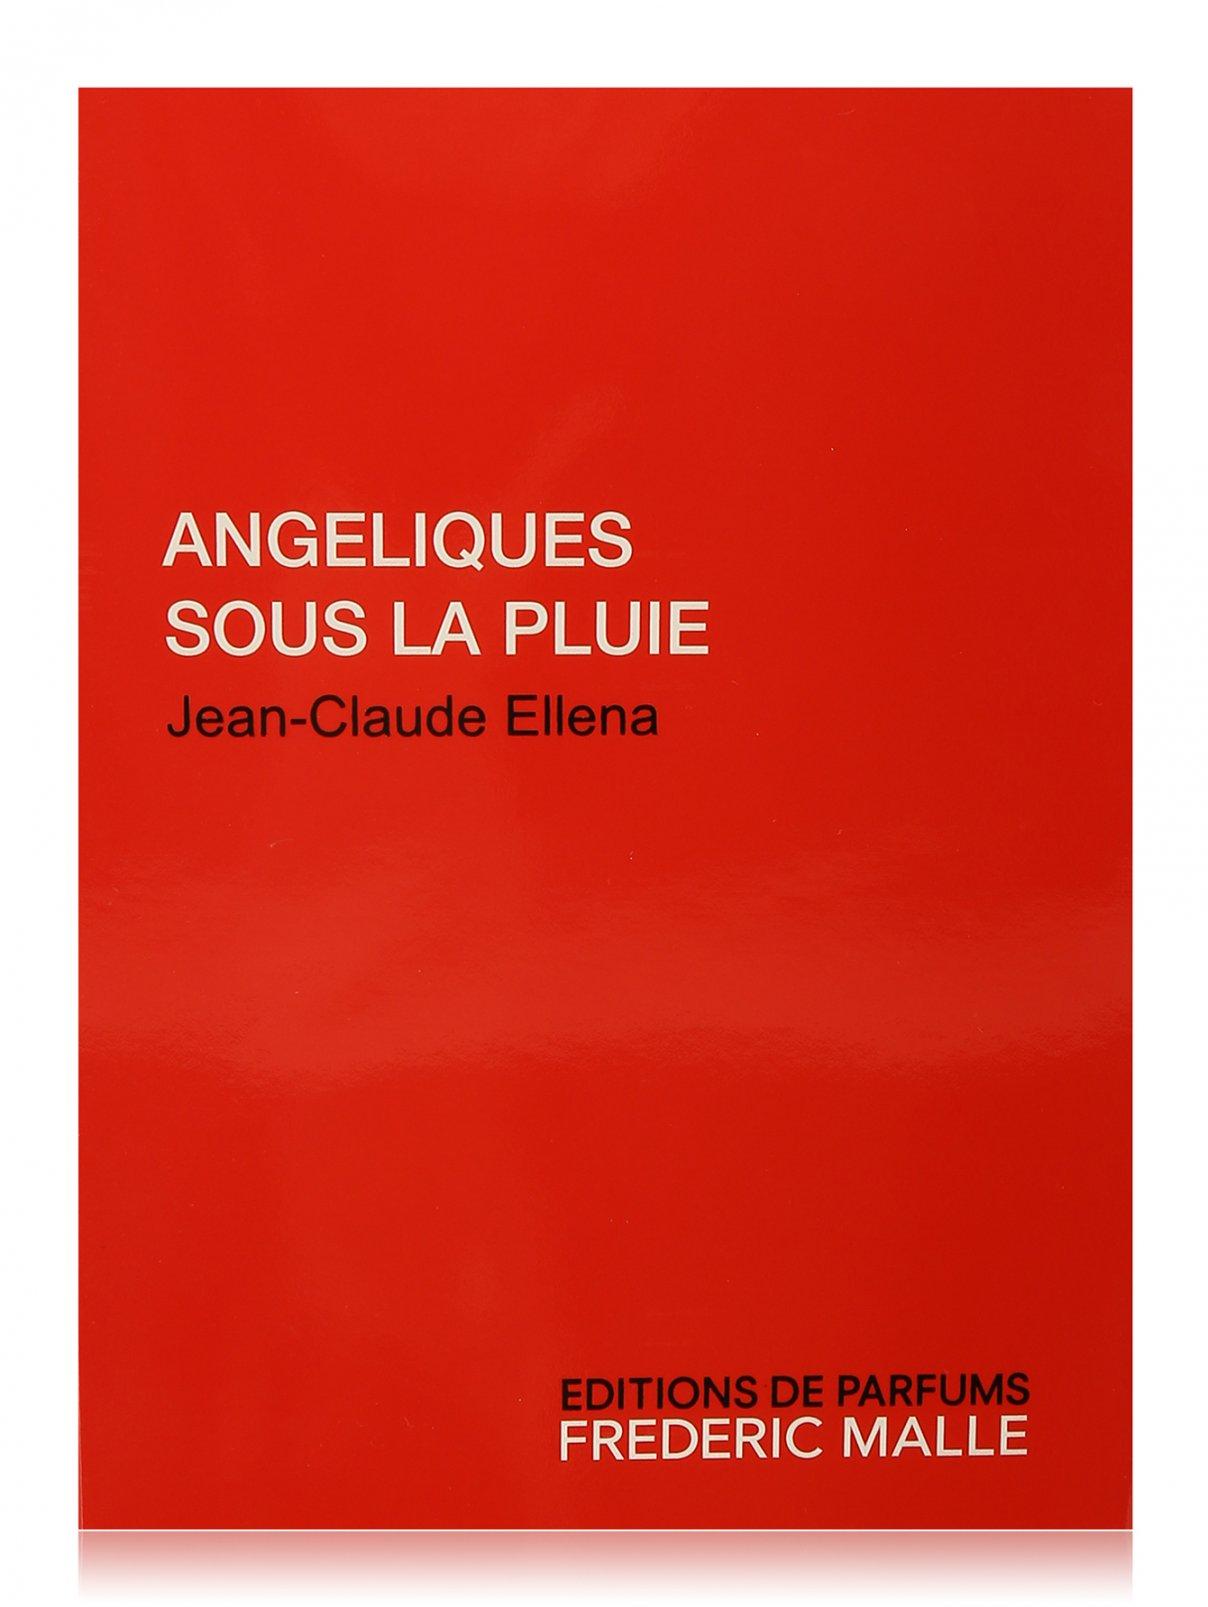 Парфюмерная вода 100 мл Angeliques Sous La Pluie Frederic Malle  –  Общий вид